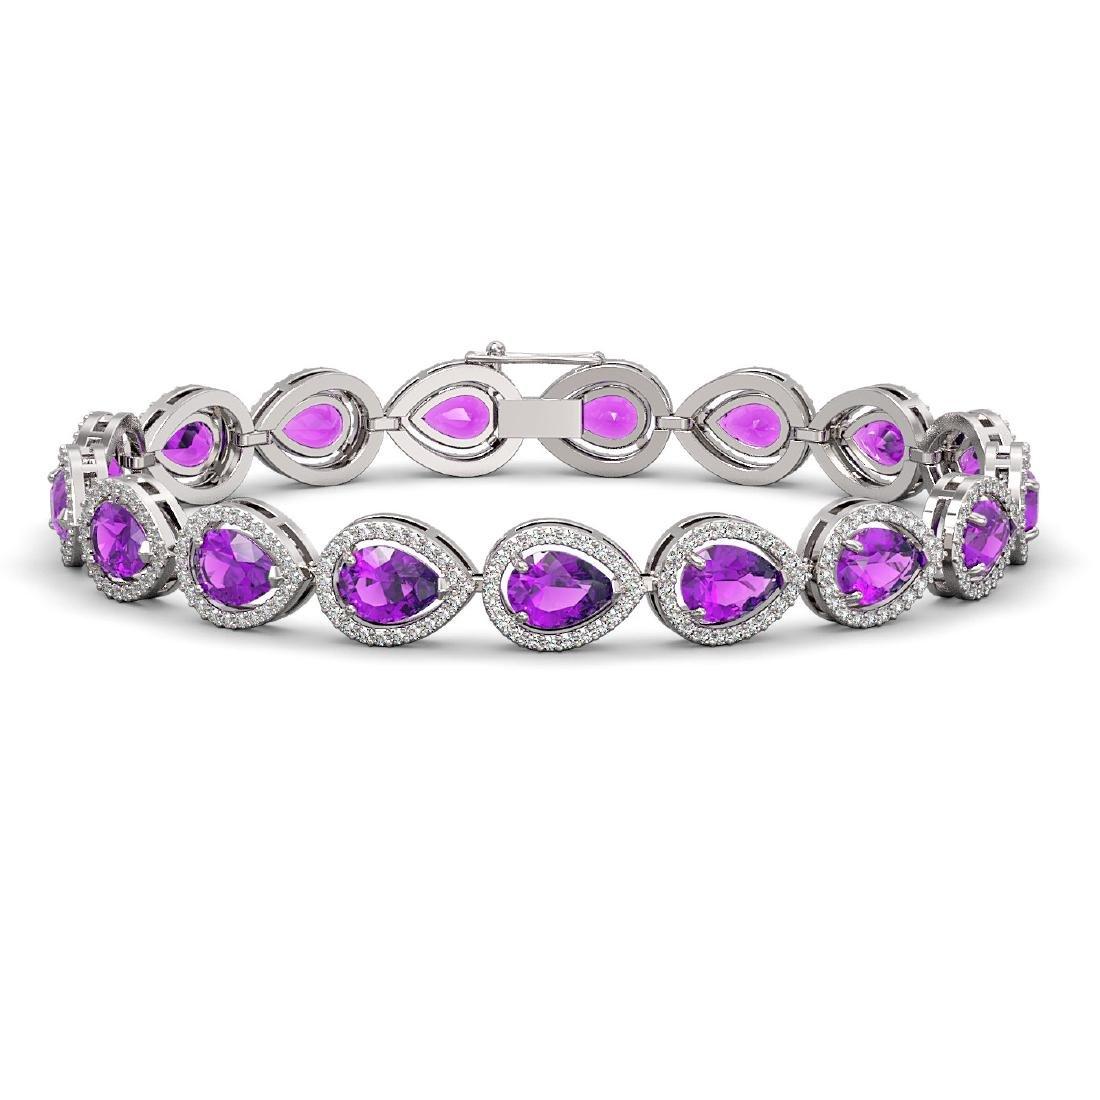 16.76 CTW Amethyst & Diamond Halo Bracelet 10K White